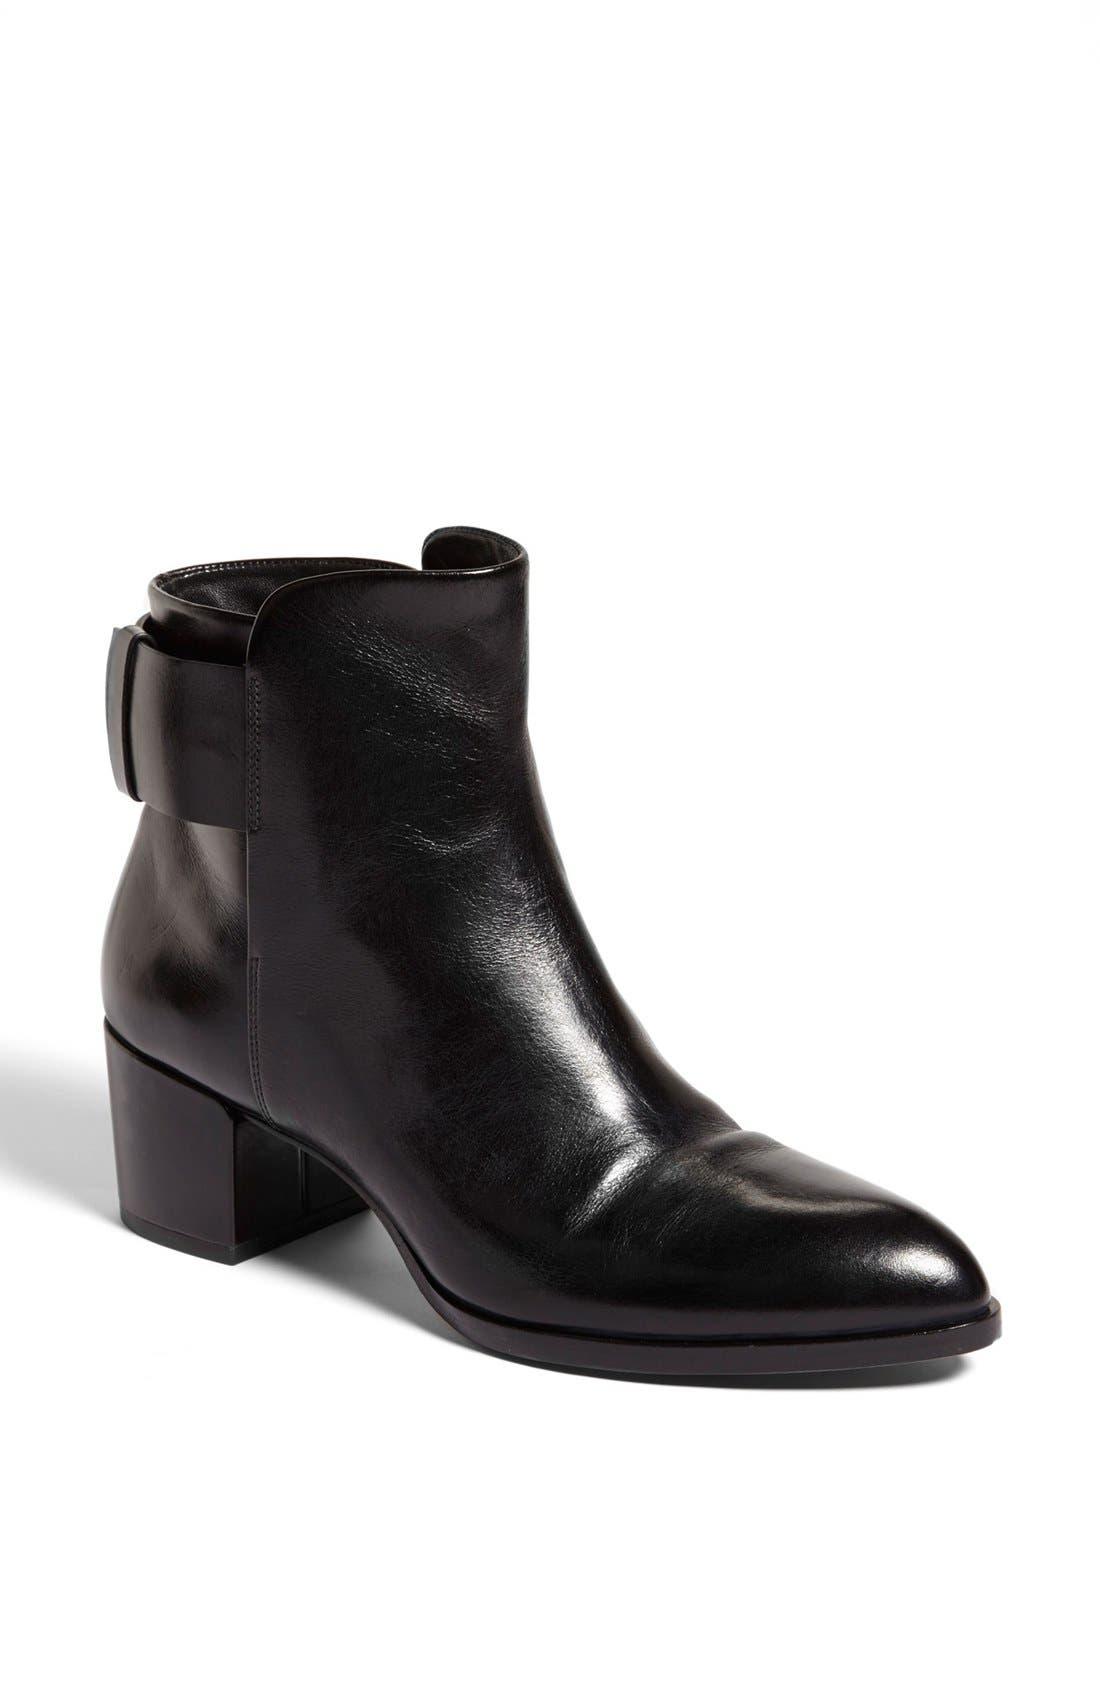 Main Image - Alexander Wang 'Anja' Calfskin Leather Ankle Boot